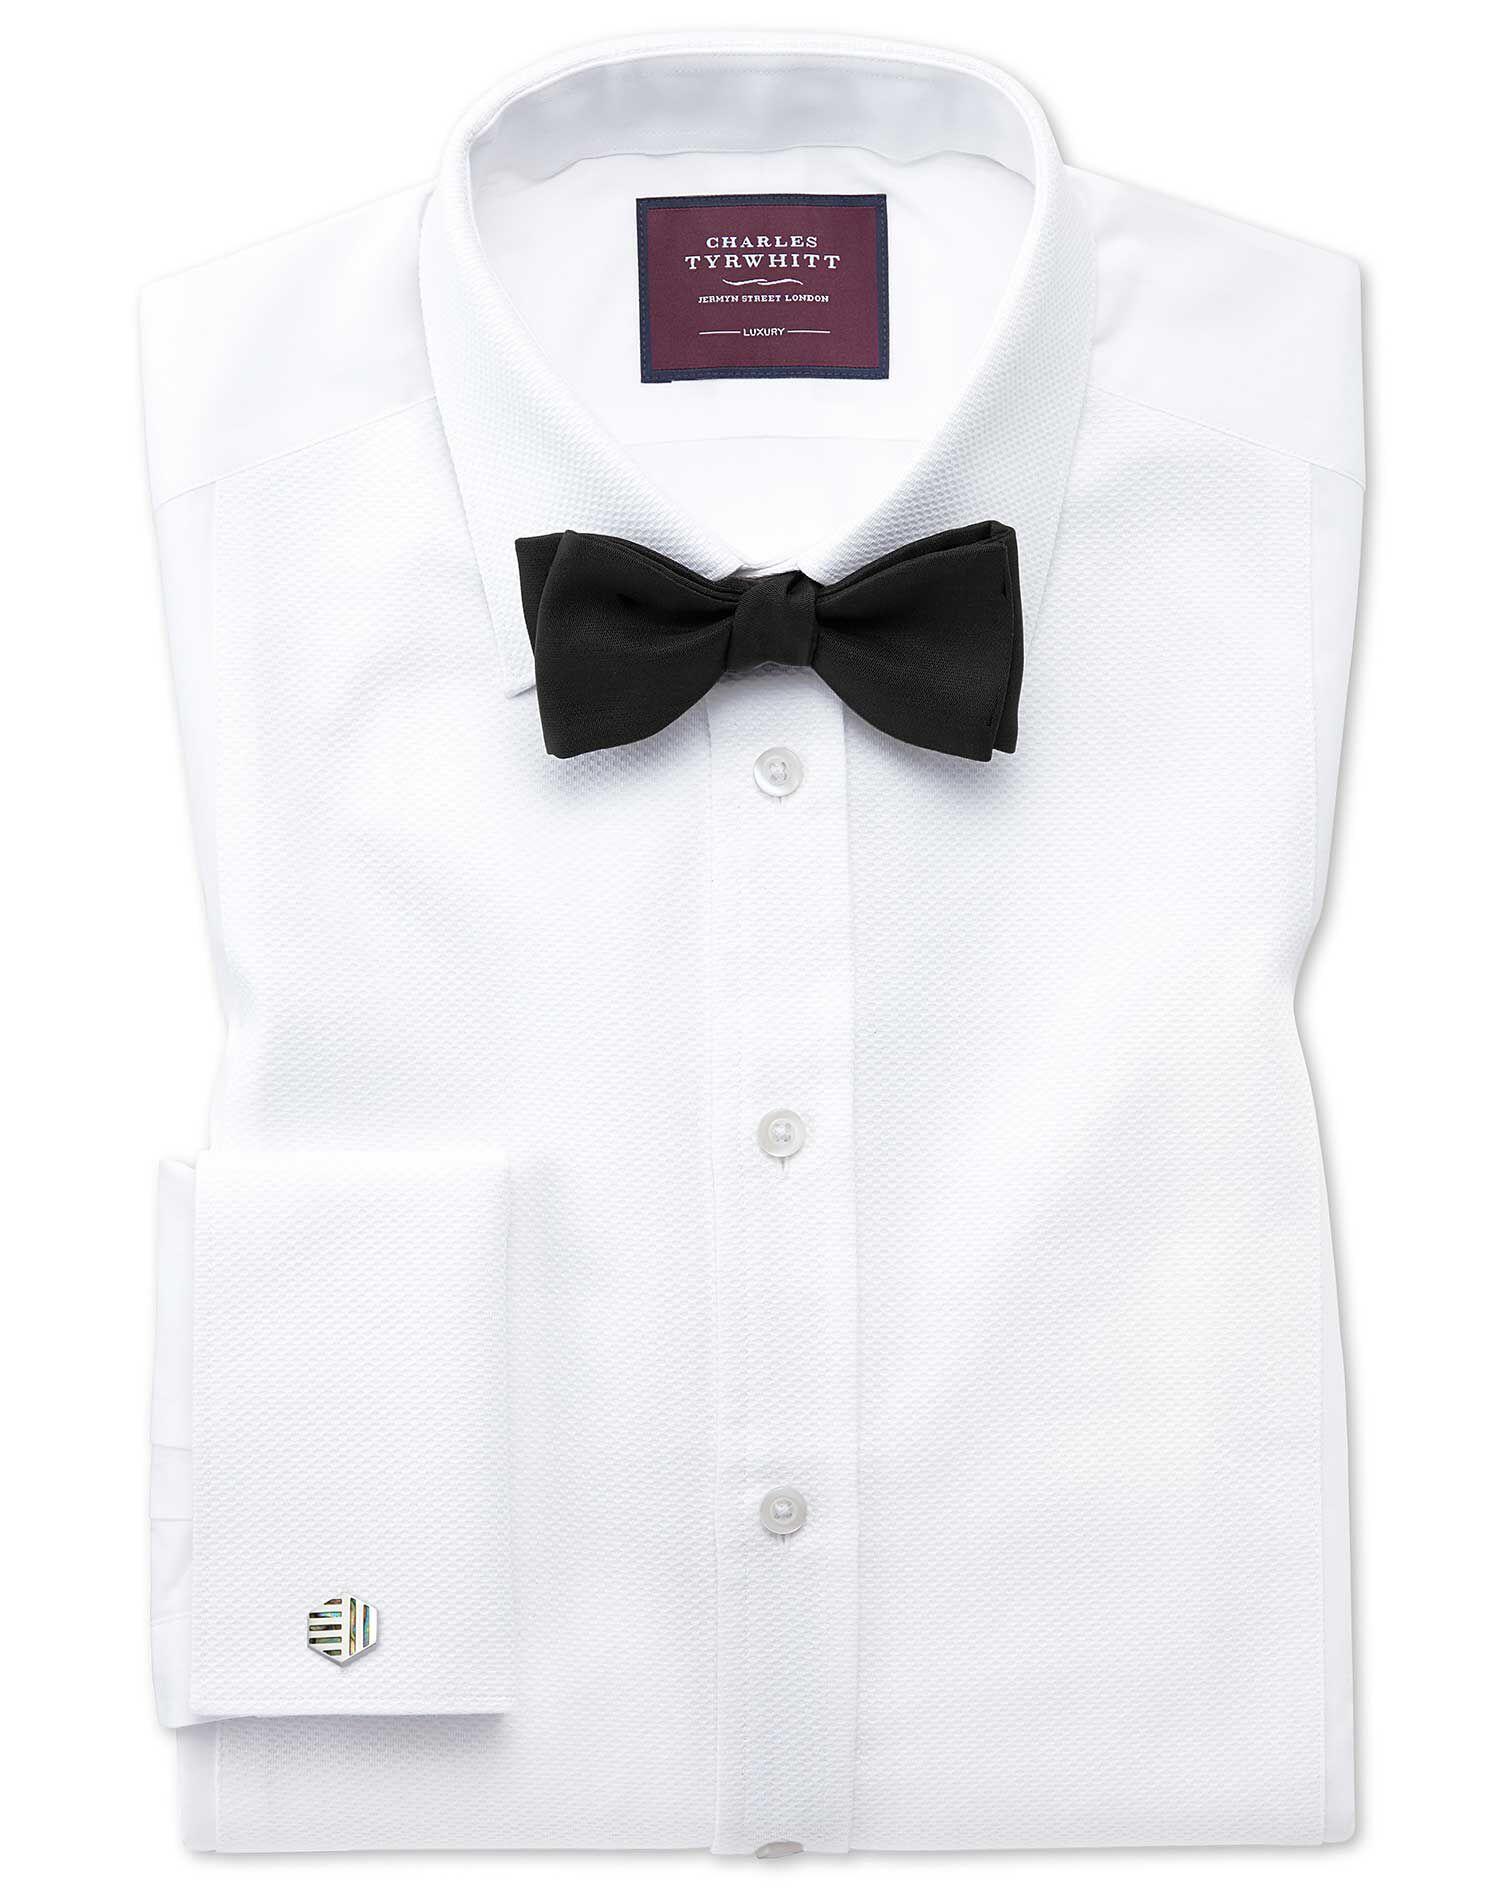 Weding Dress Shirt Collar